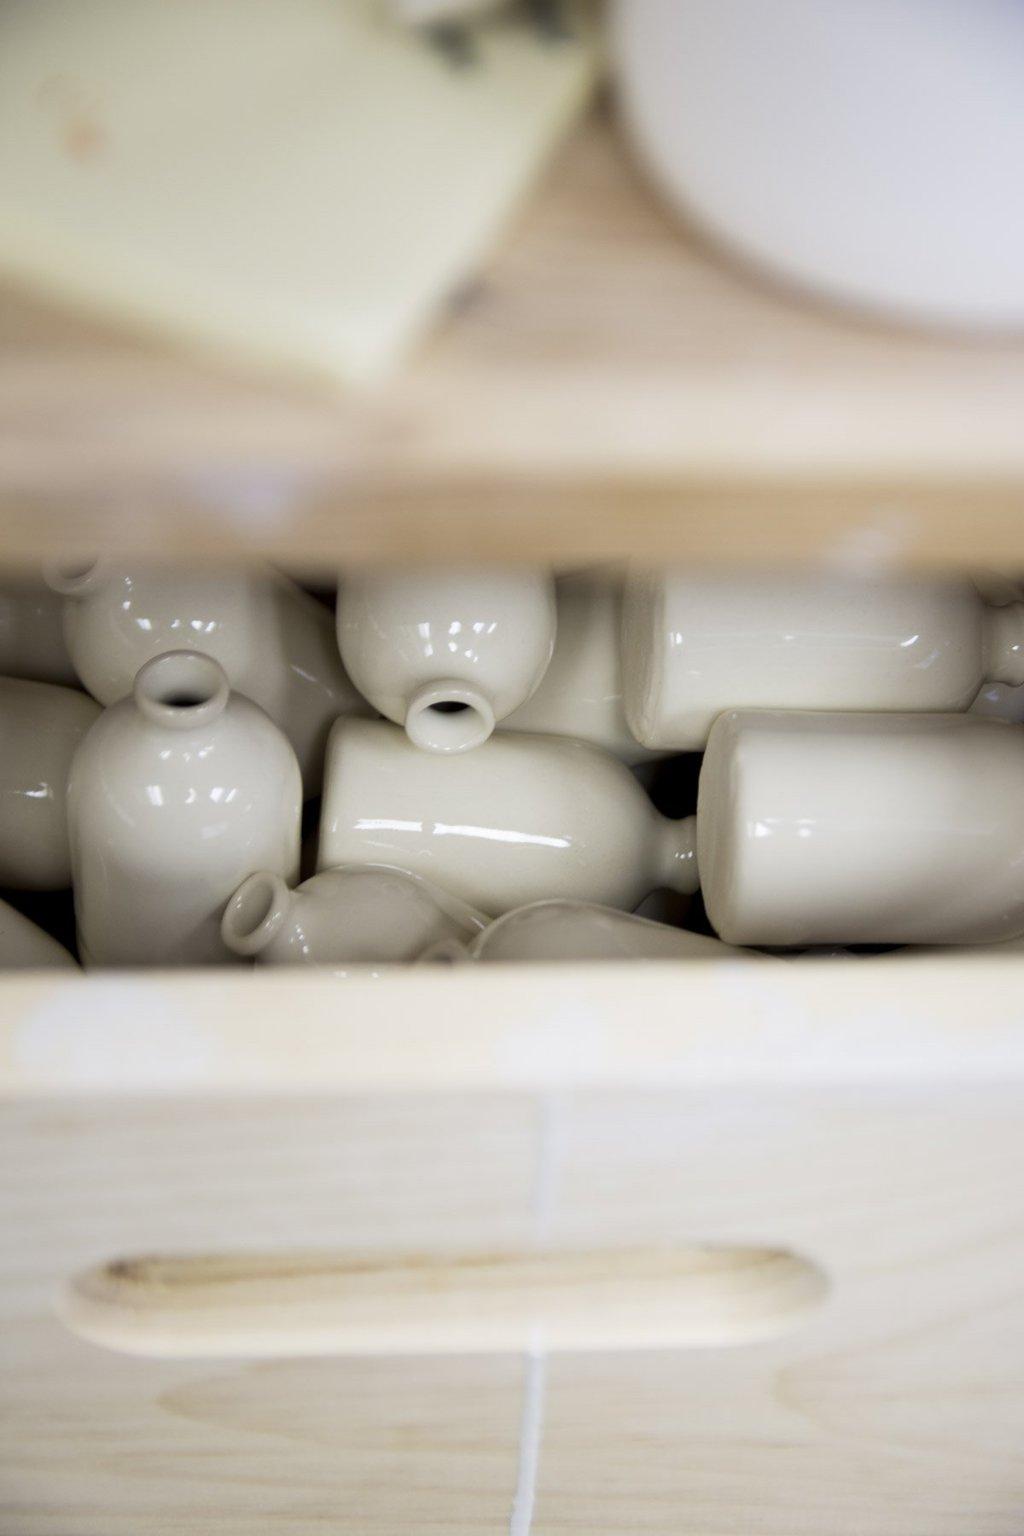 Honeycomb Studio handmade small batch ceramics in Atlanta, GA on Thou Swell @thouswellblog